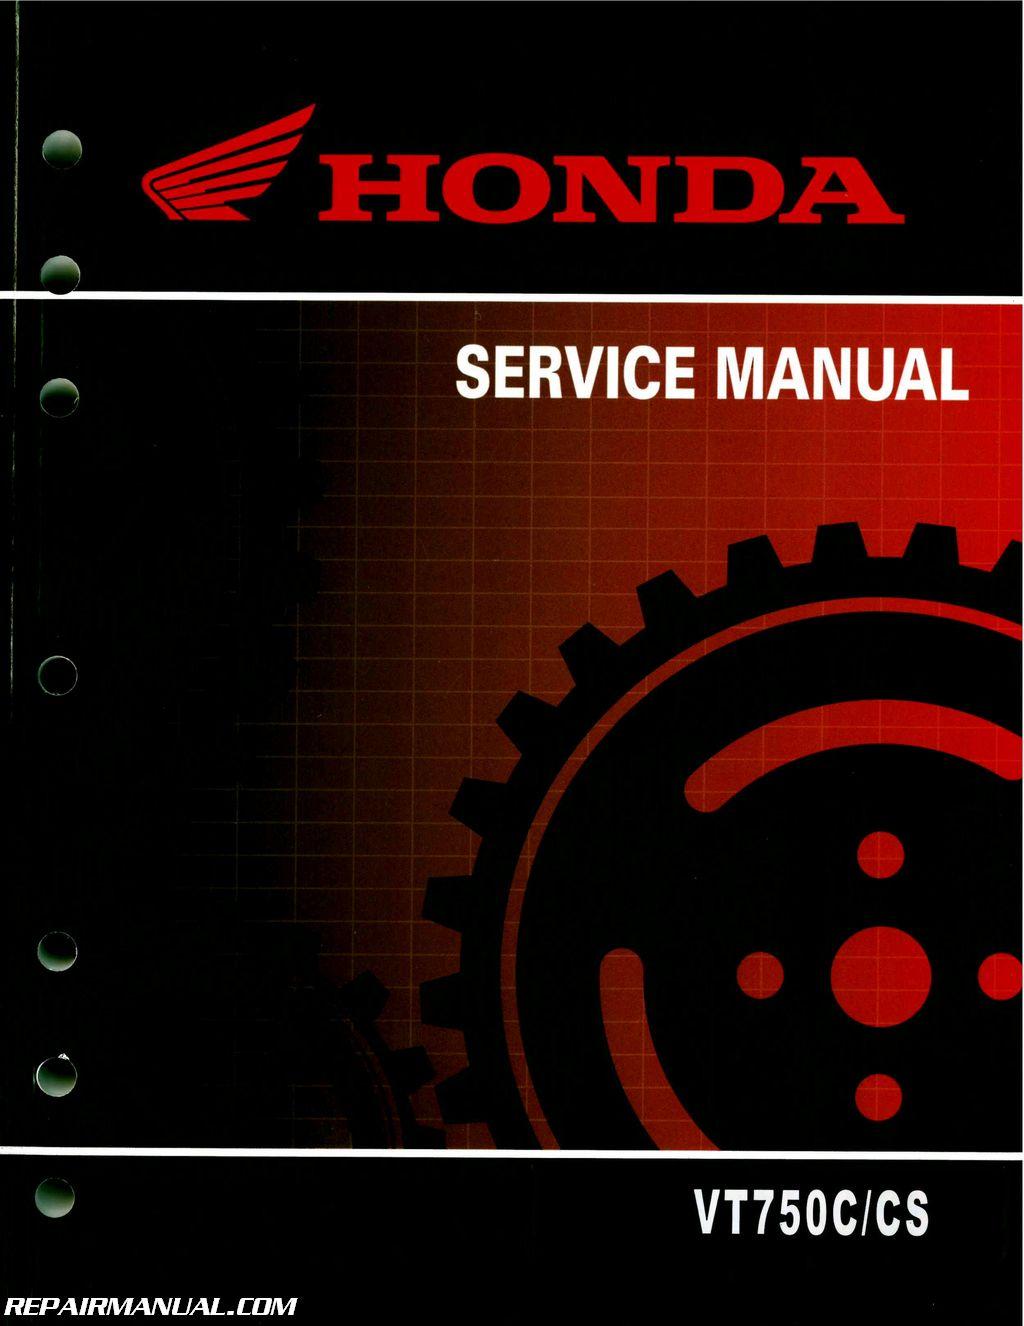 ... Array - honda vt750c service manual open source user manual u2022 rh  dramatic varieties com